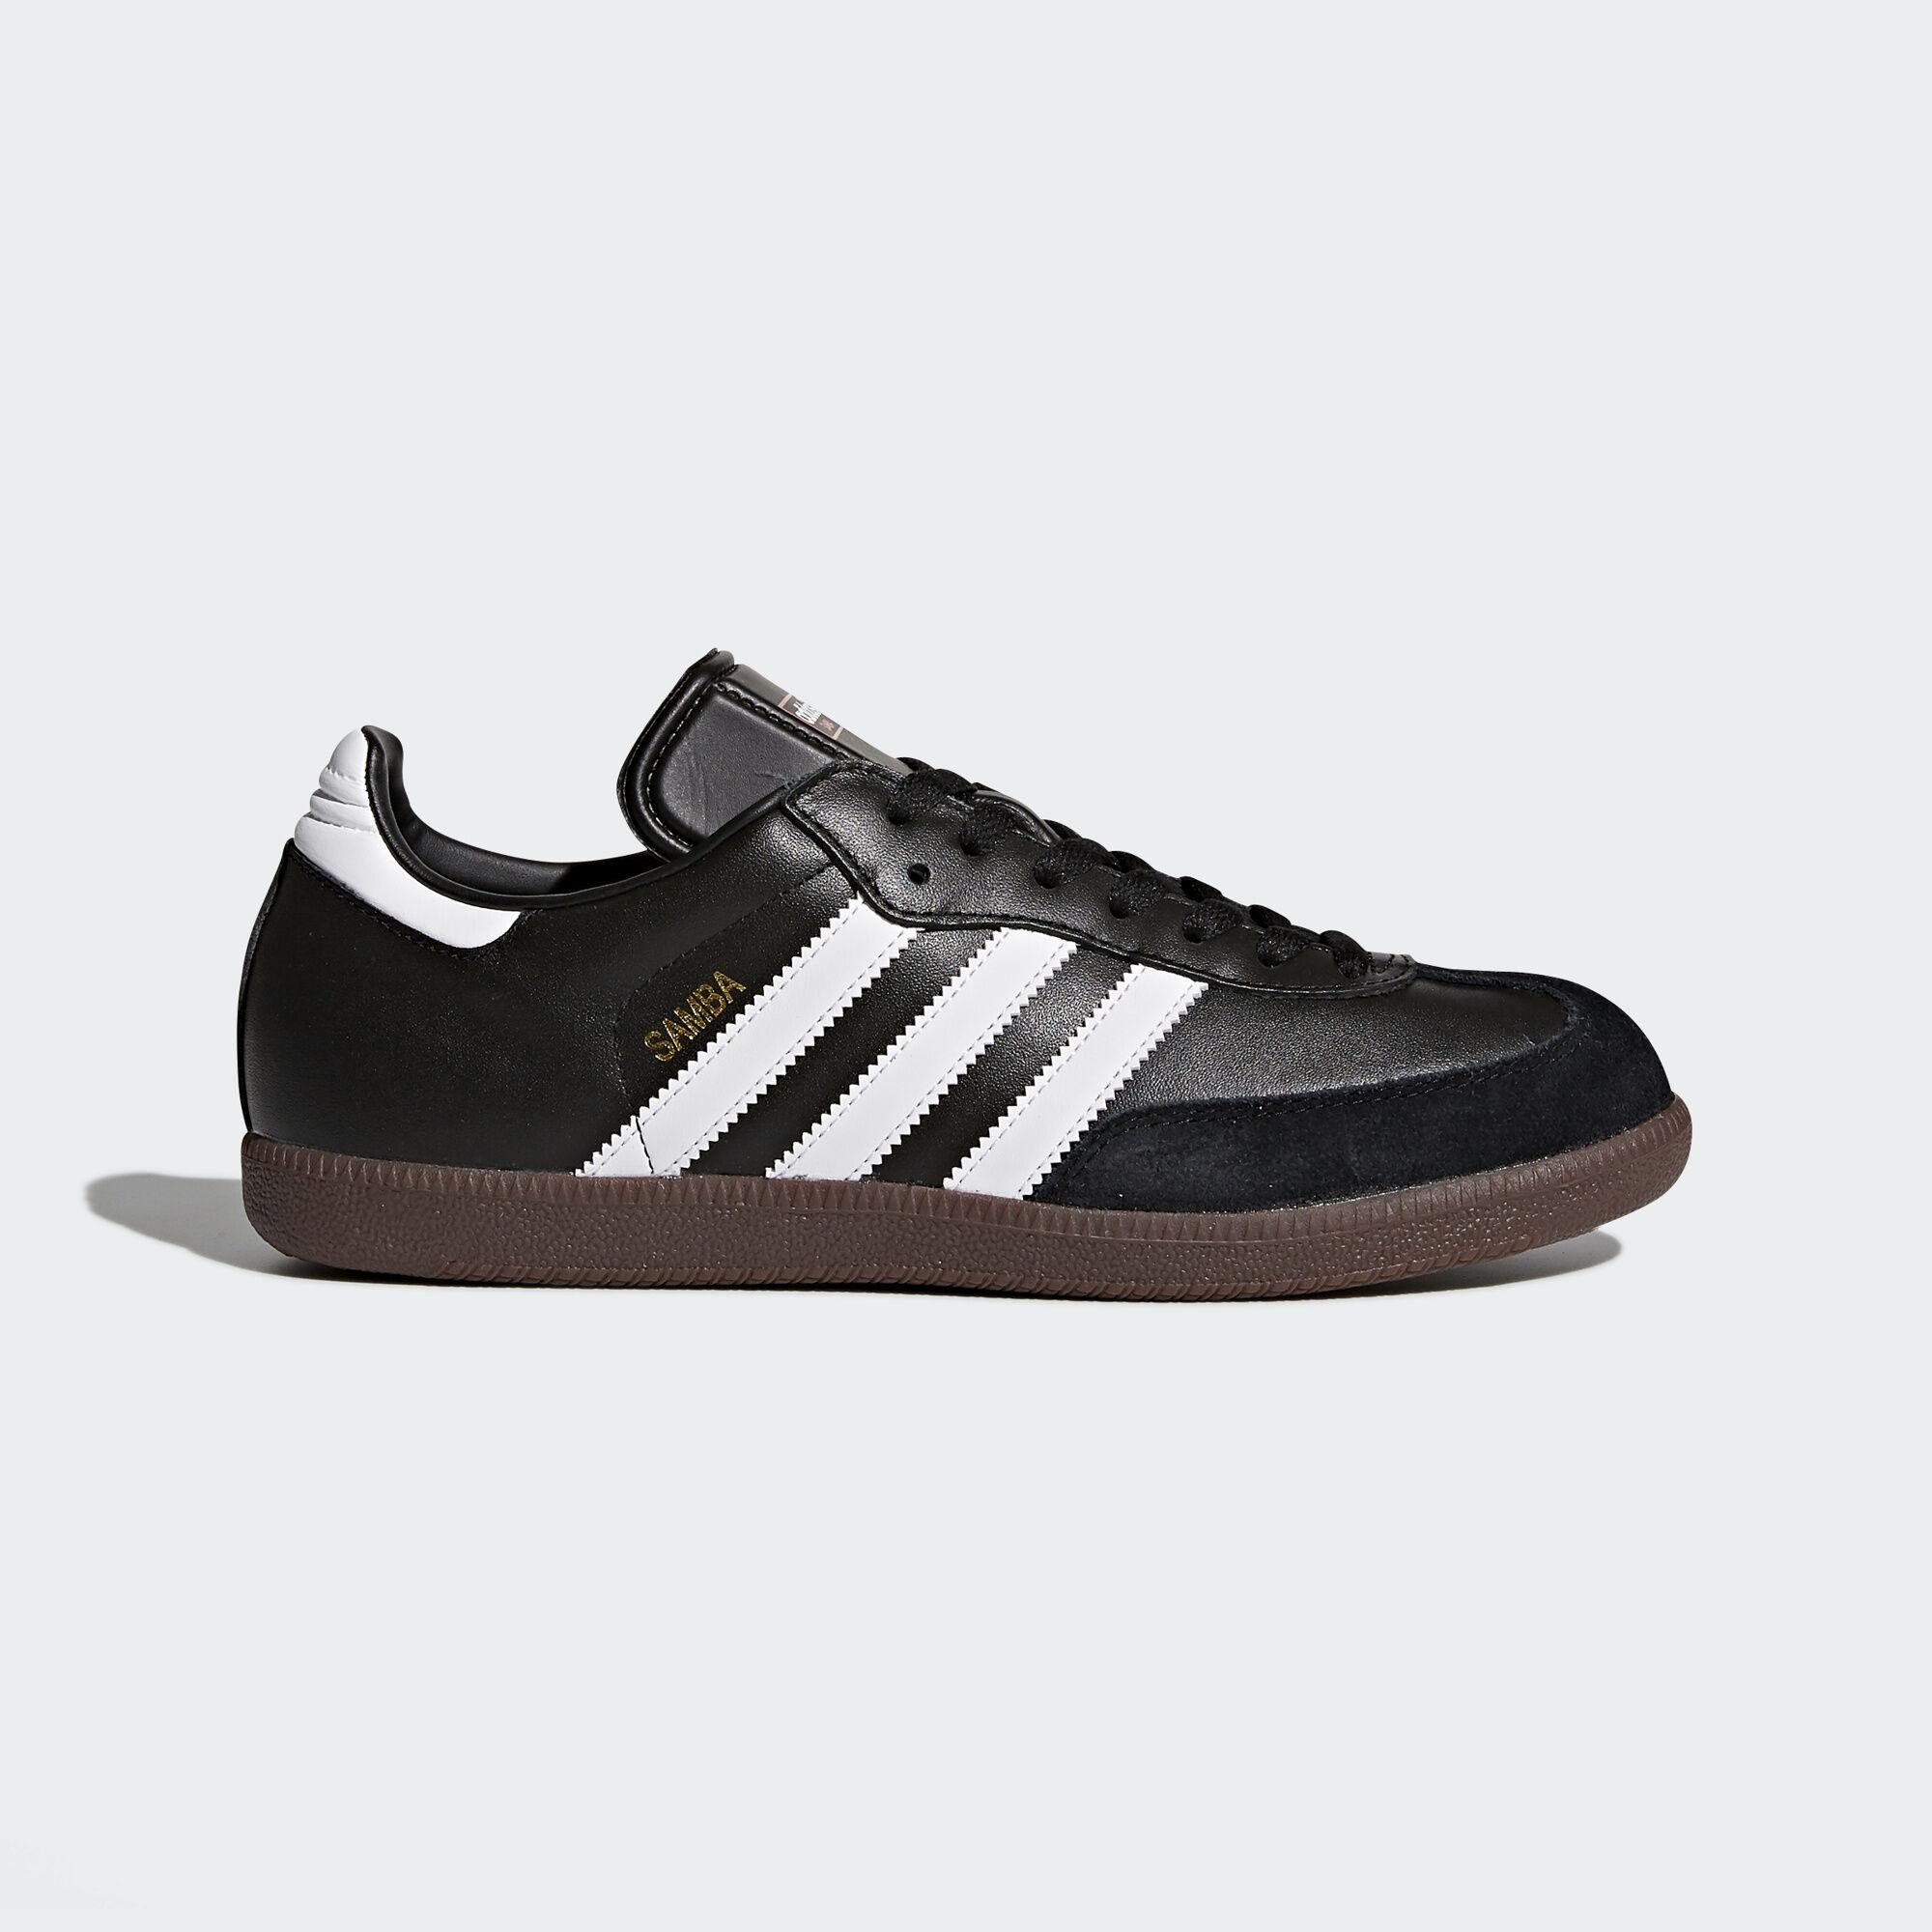 Adidas Schuhe Rot Schwarz